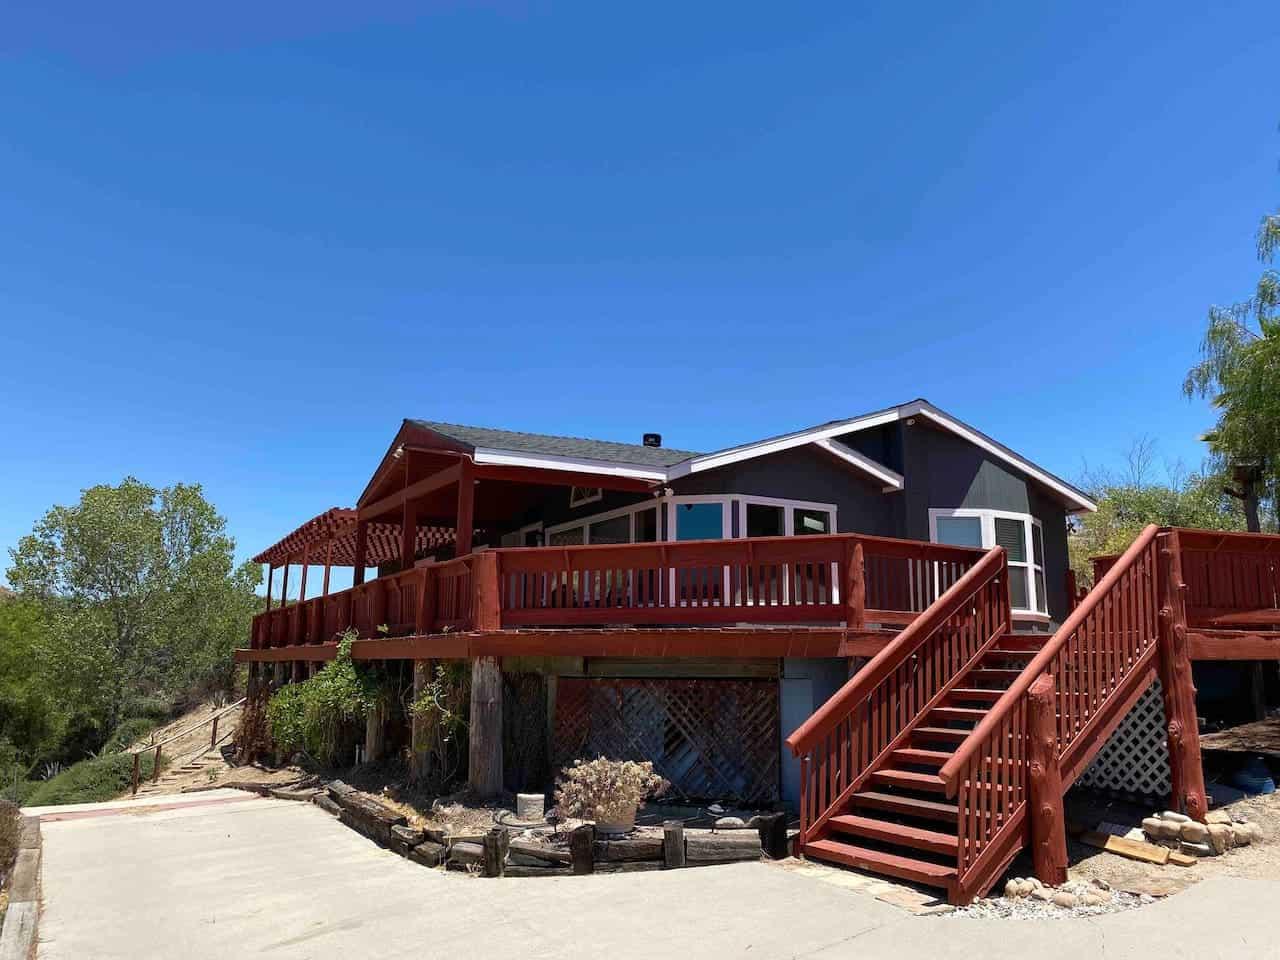 Image of Airbnb rental in Temecula, California